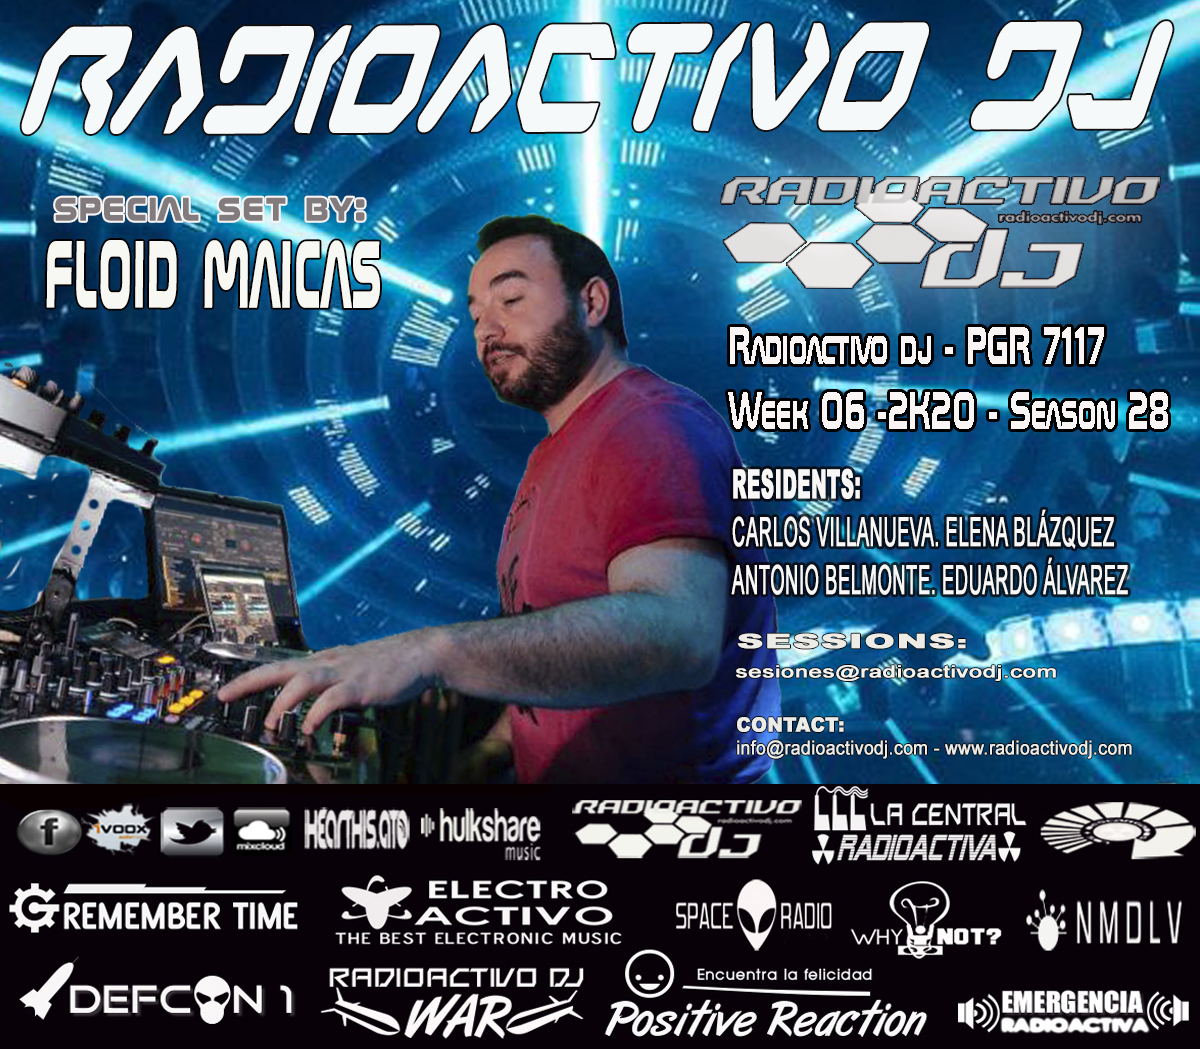 RADIOACTIVO-DJ-06-2020